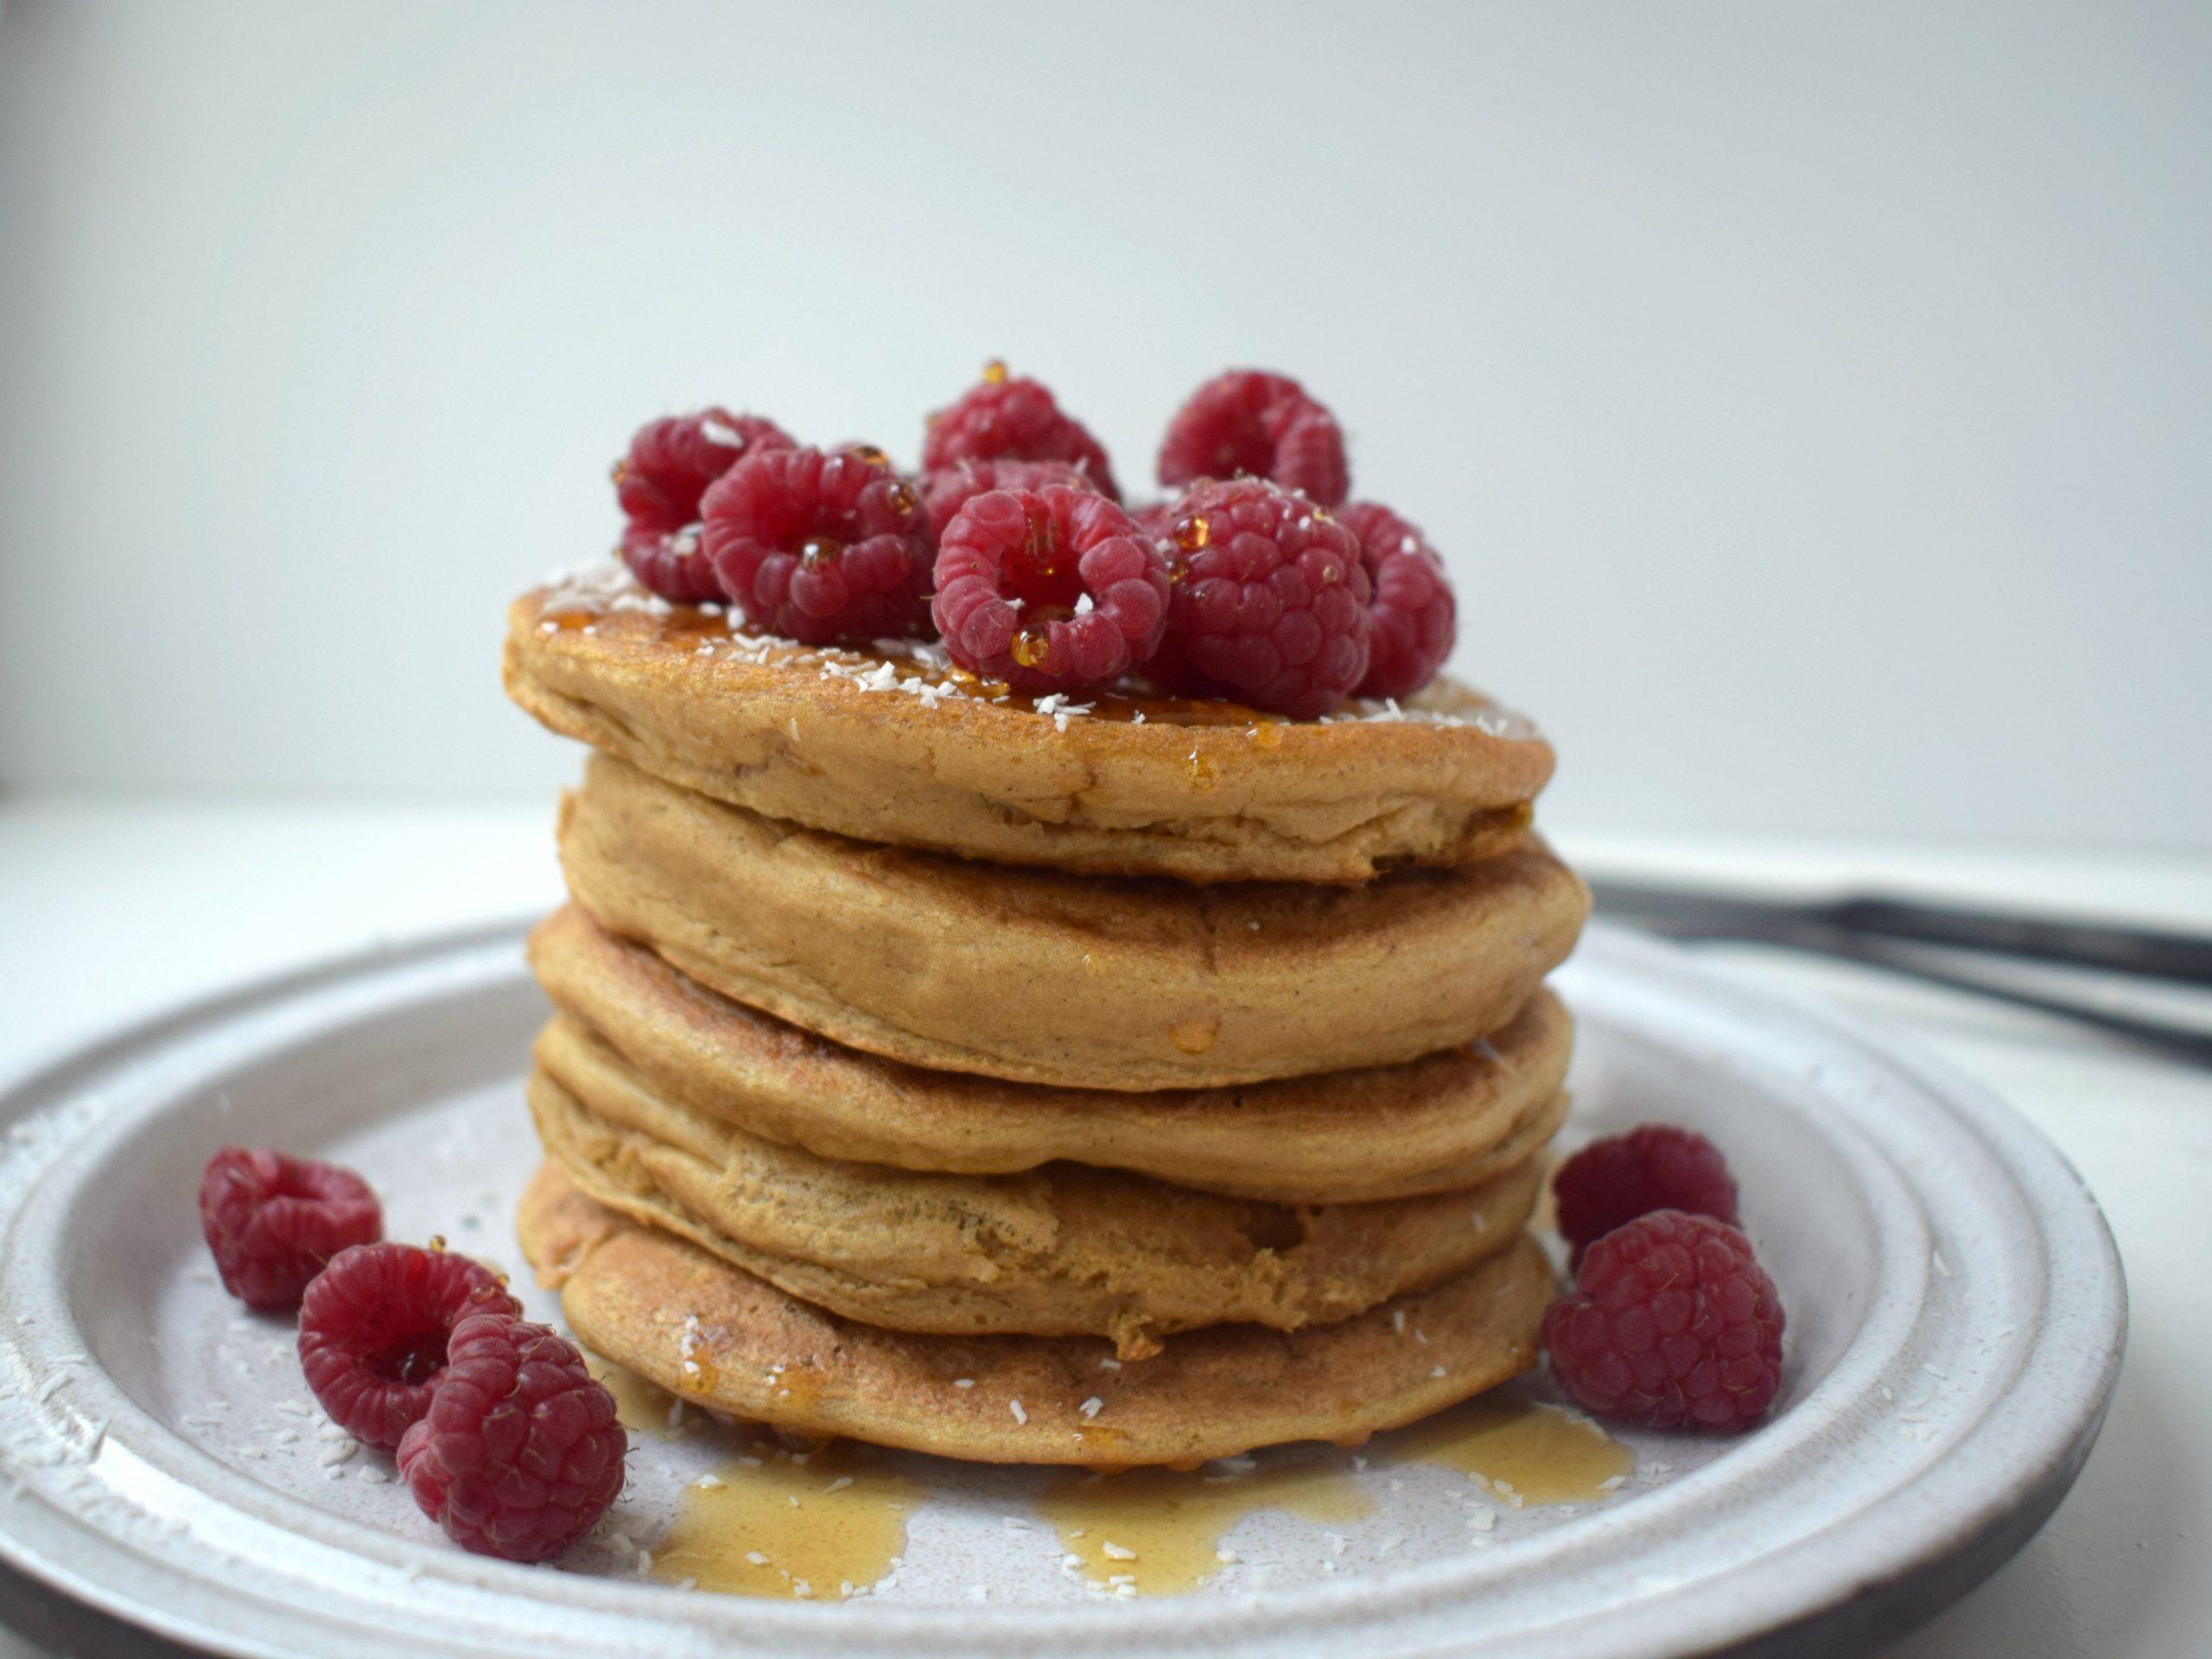 Fluffy vegan American protein pancakes